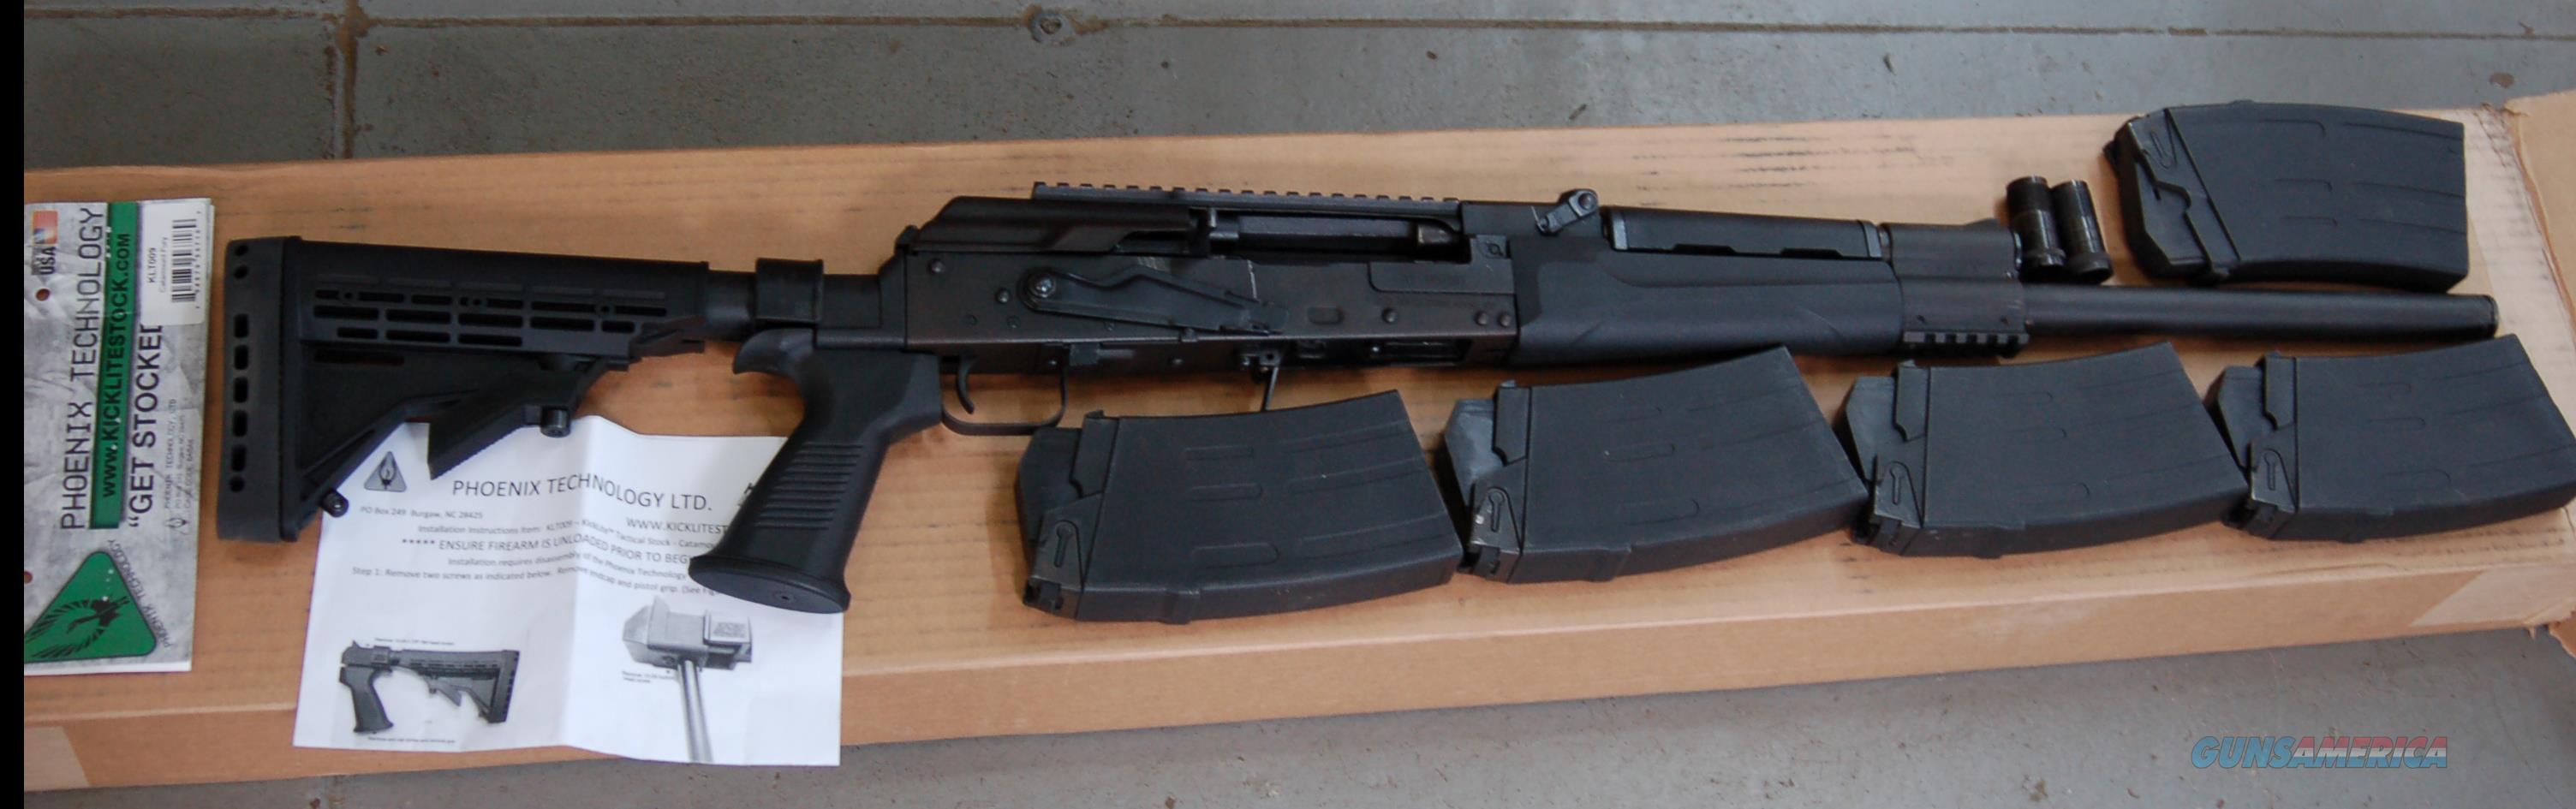 Catamount Fury 12 Gauge, Adj Stock,(5) Mags, (3) Chokes  Guns > Shotguns > Century International Arms - Shotguns > Shotguns